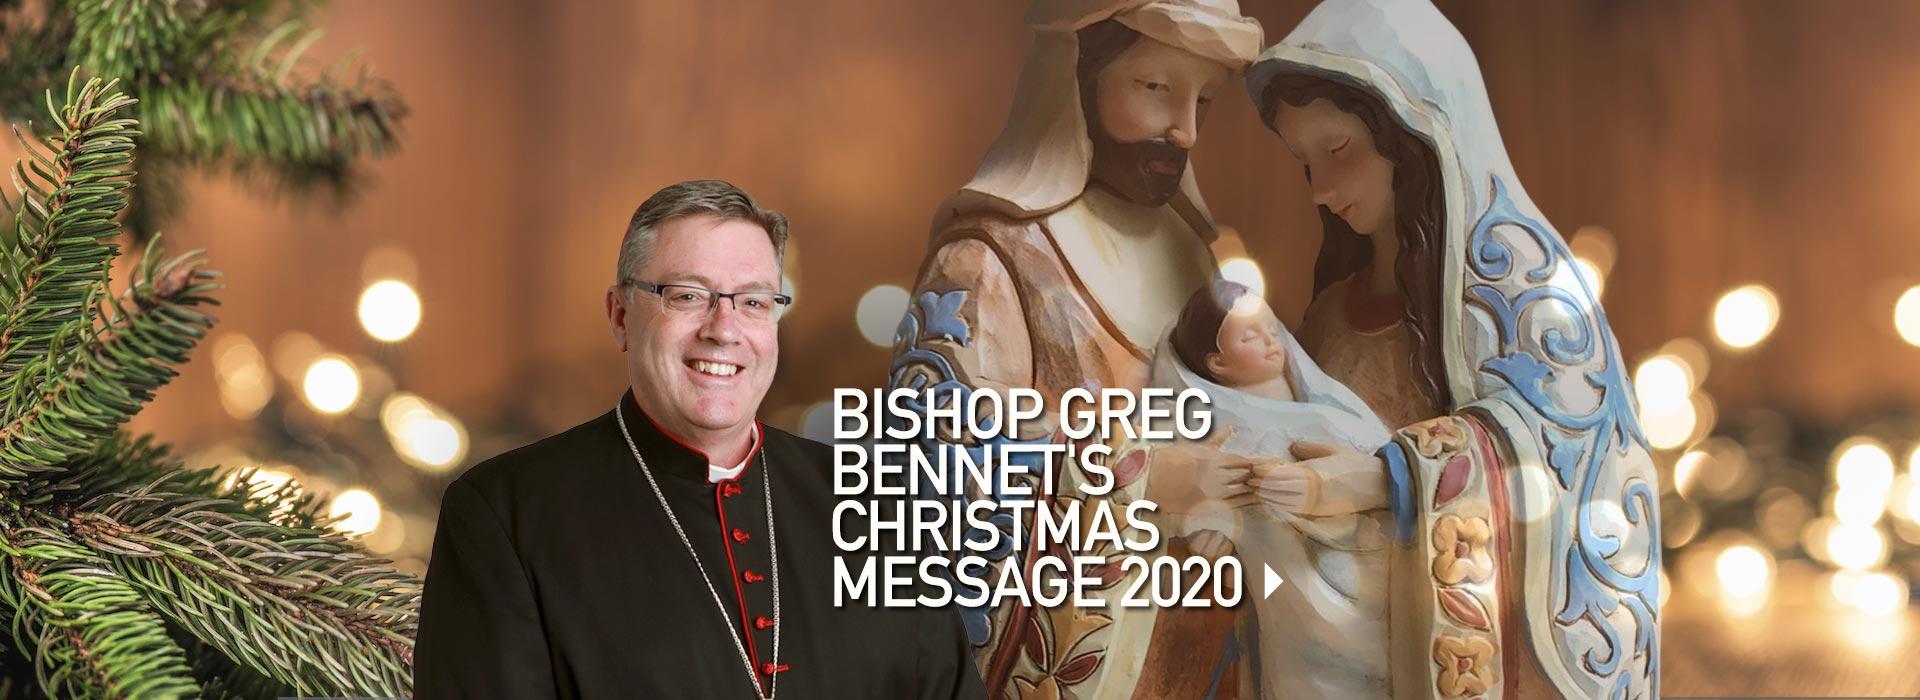 Bishop Greg Bennet's Christmas Message 2020